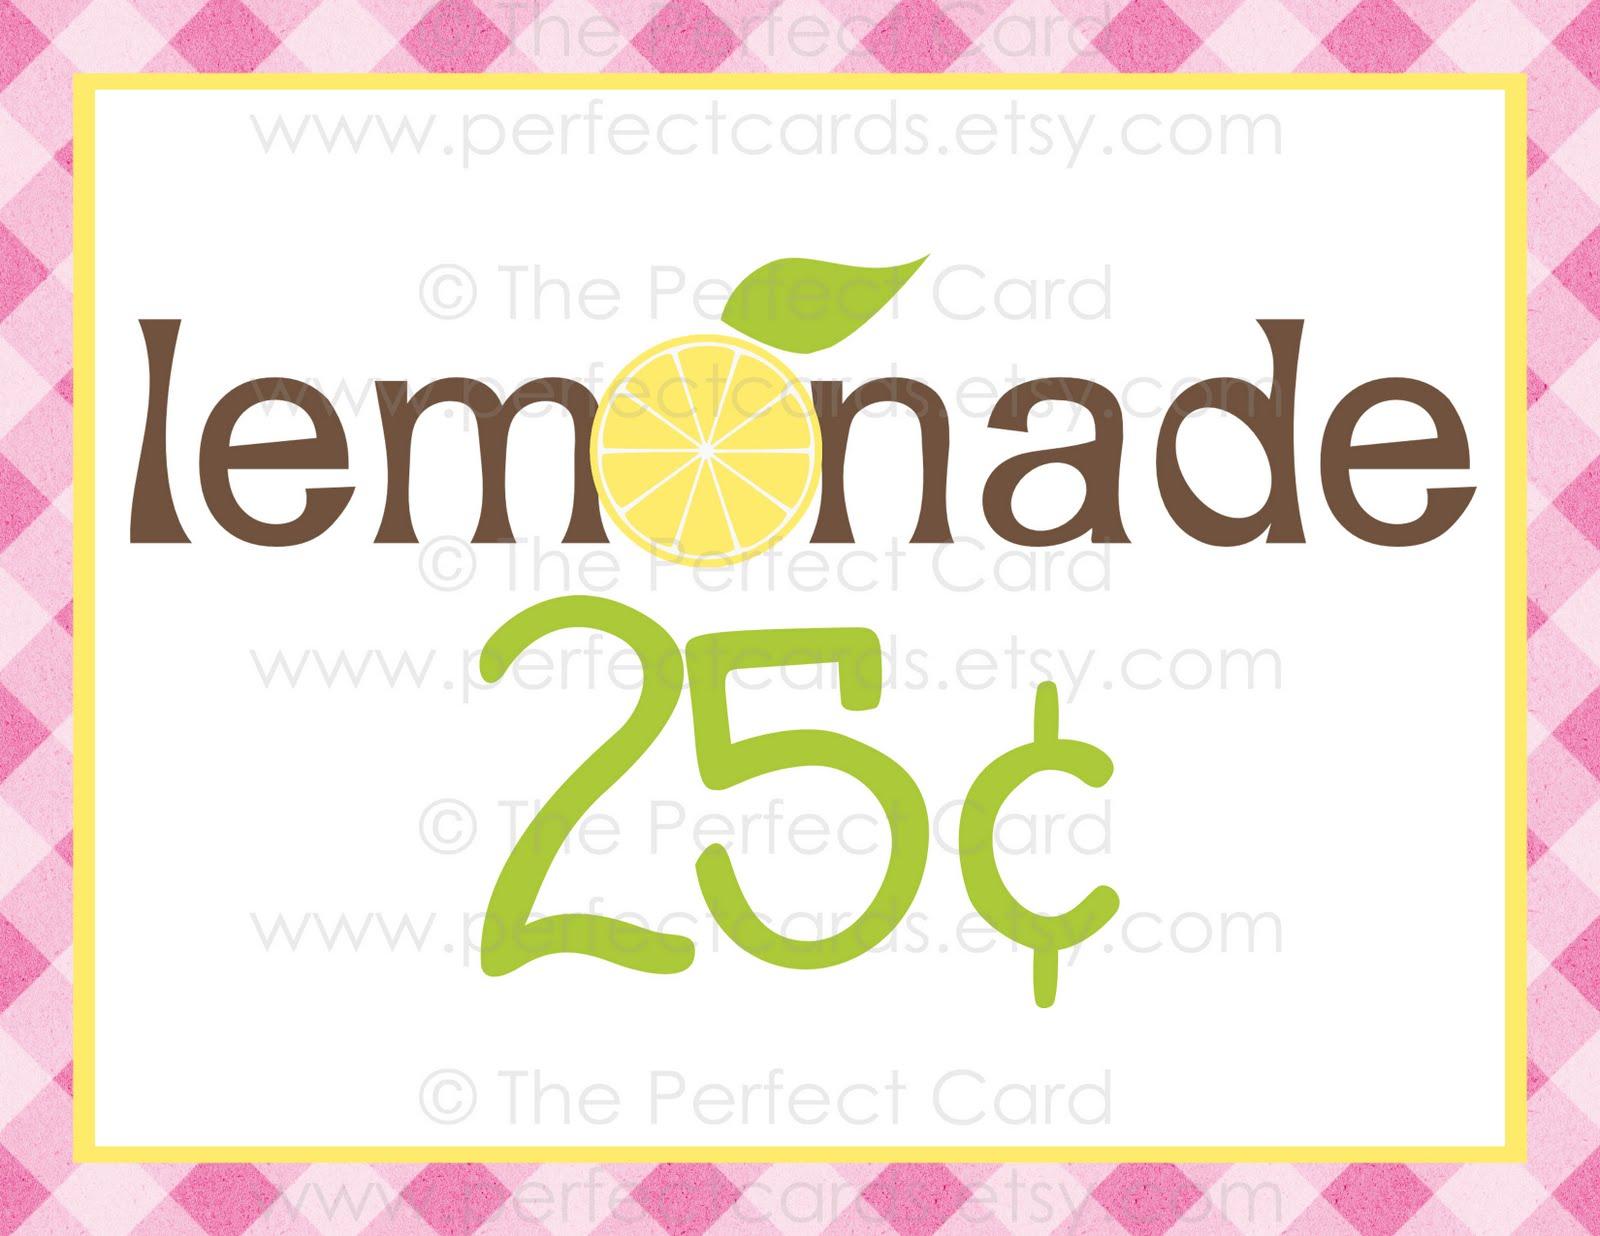 The Perfect Card: Lemonade Stand Printable Set GIVEAWAY!Lemonade Sign Free